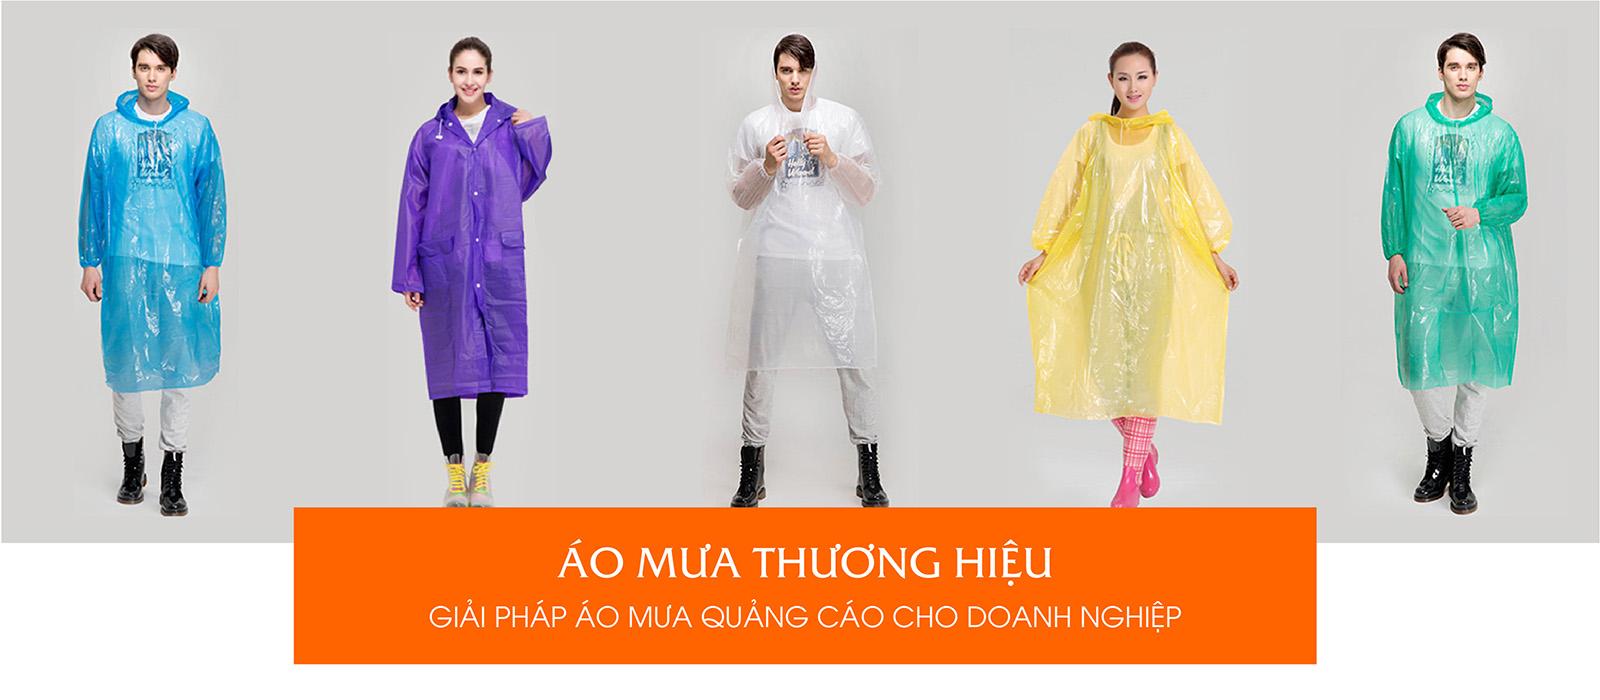 Banner ao mua thuong hieu 10